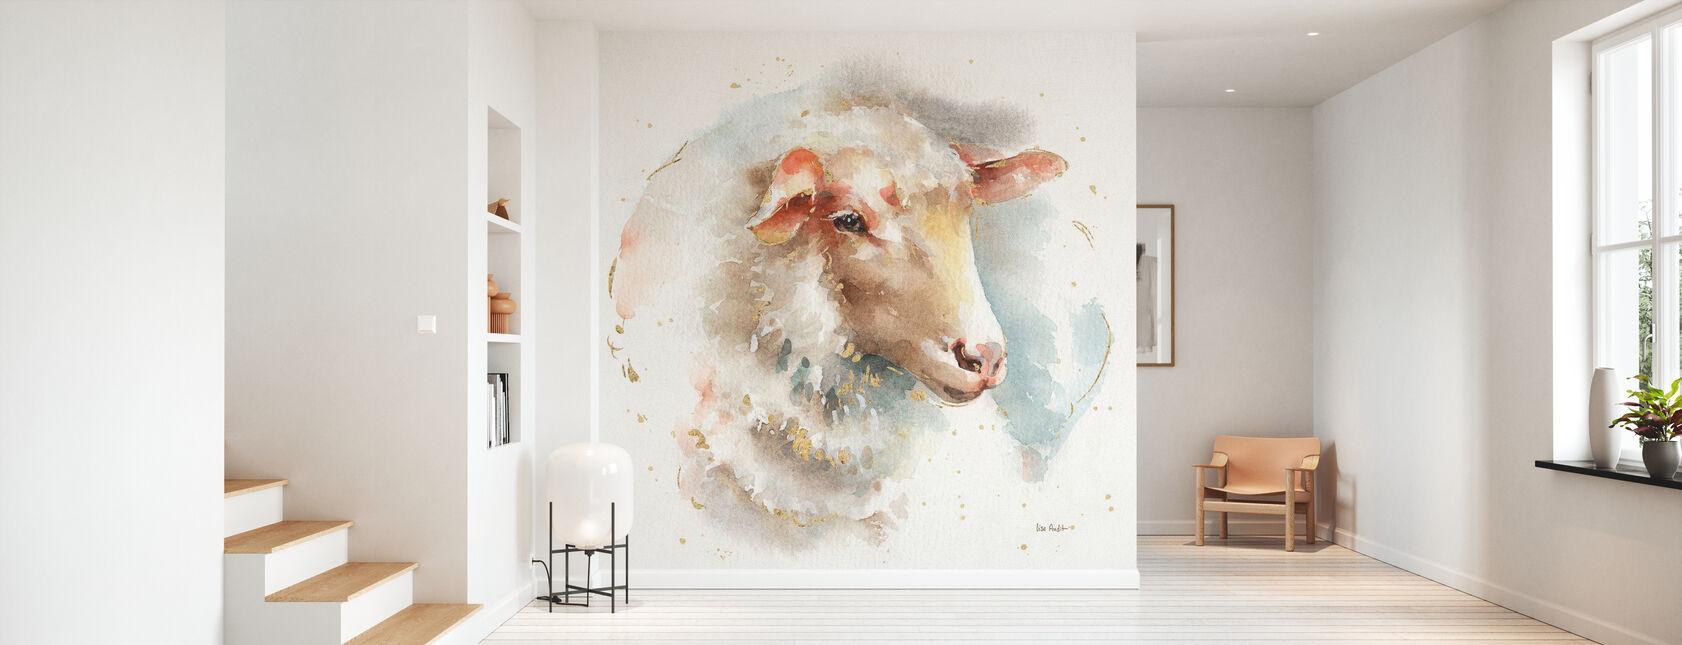 Farm Friends III - Wallpaper - Hallway